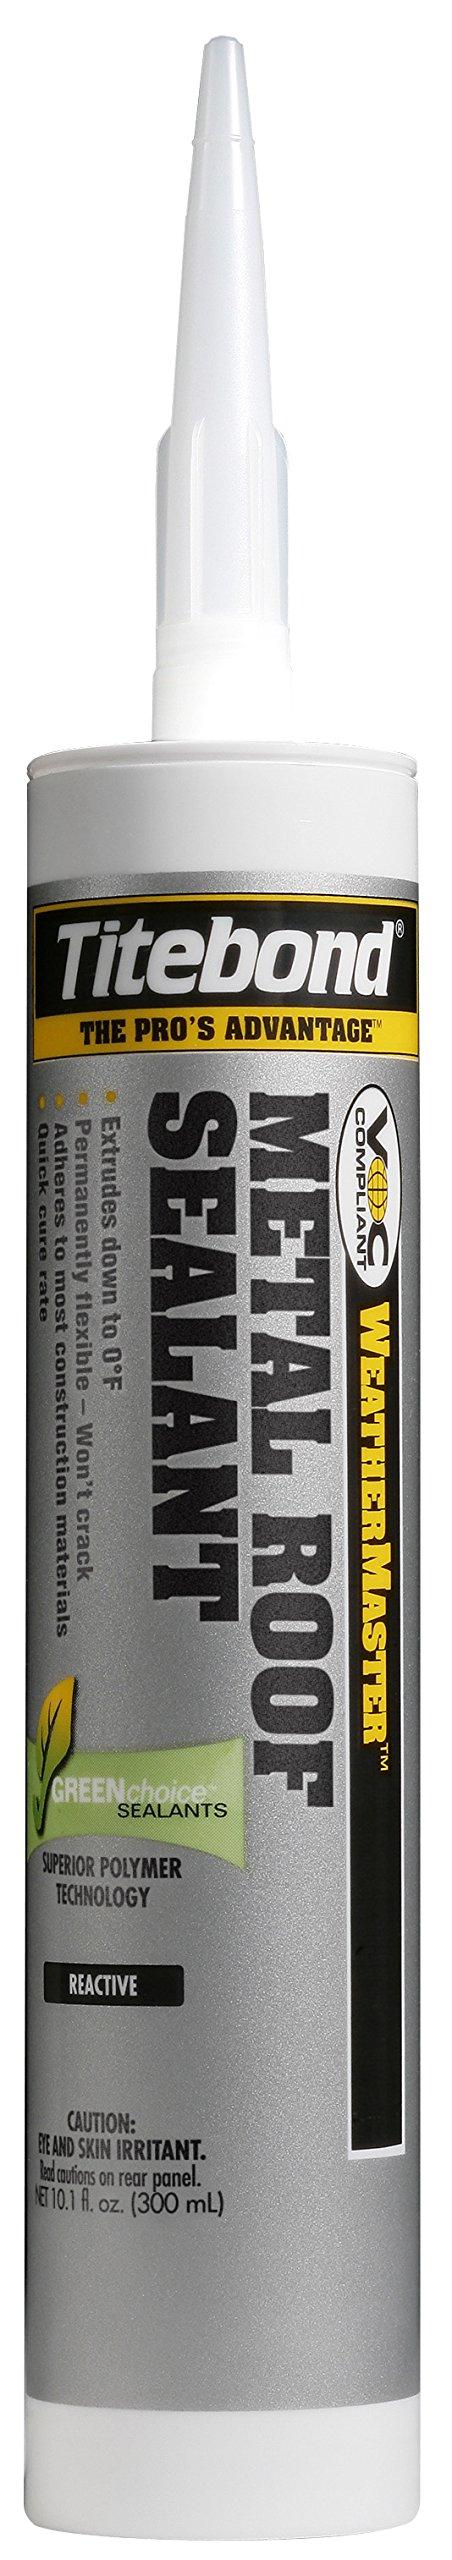 Titebond 62401 Metal Roof Sealant Cartridge, 10.1 oz., Gray